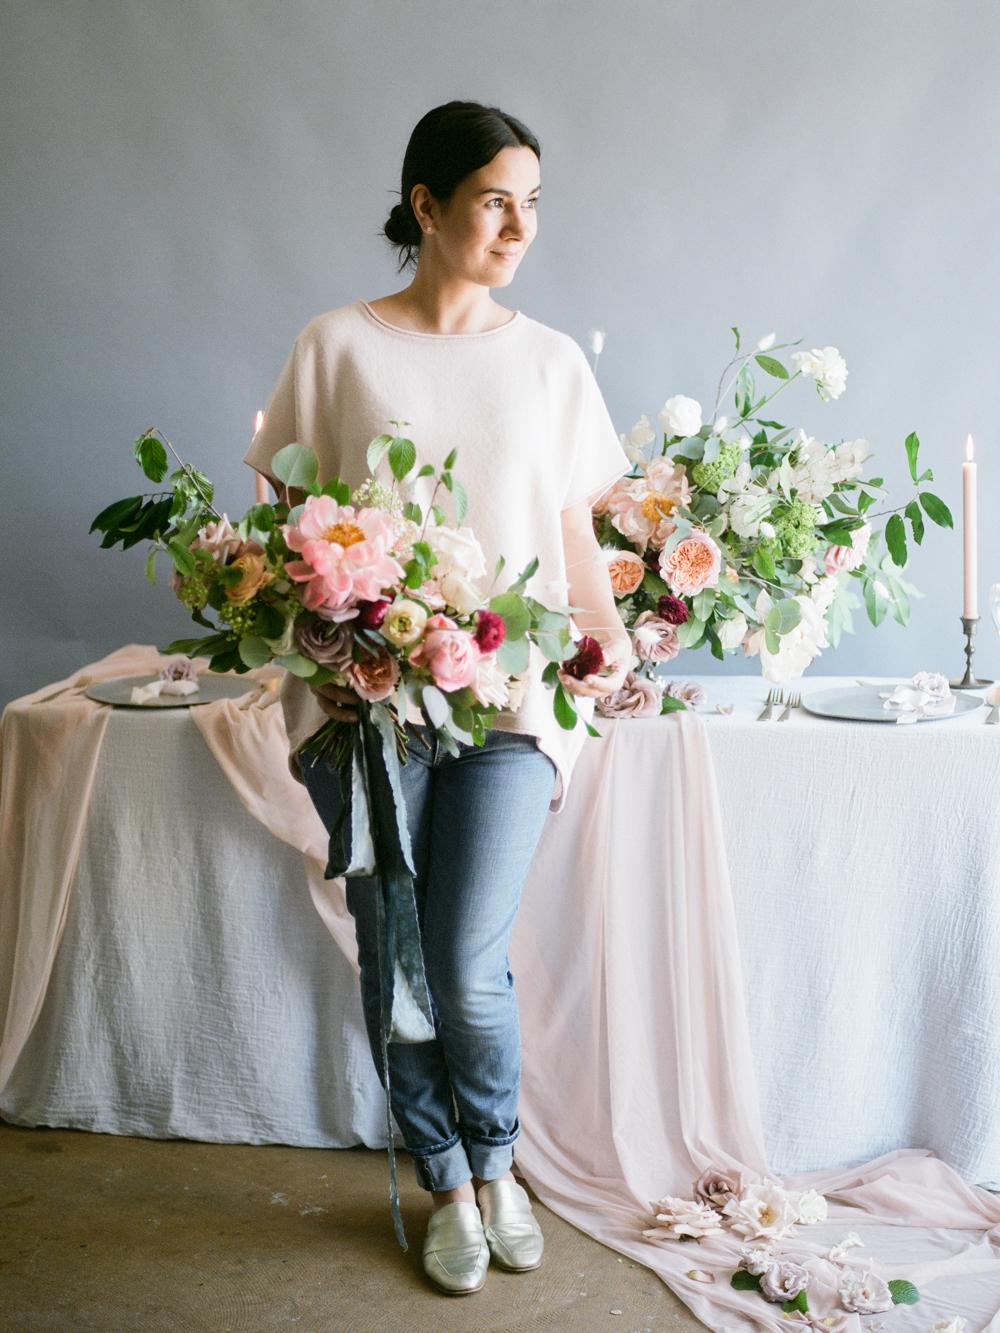 Christine Gosch - brand photographer - Maxit flower design - wedding florist-4.jpg